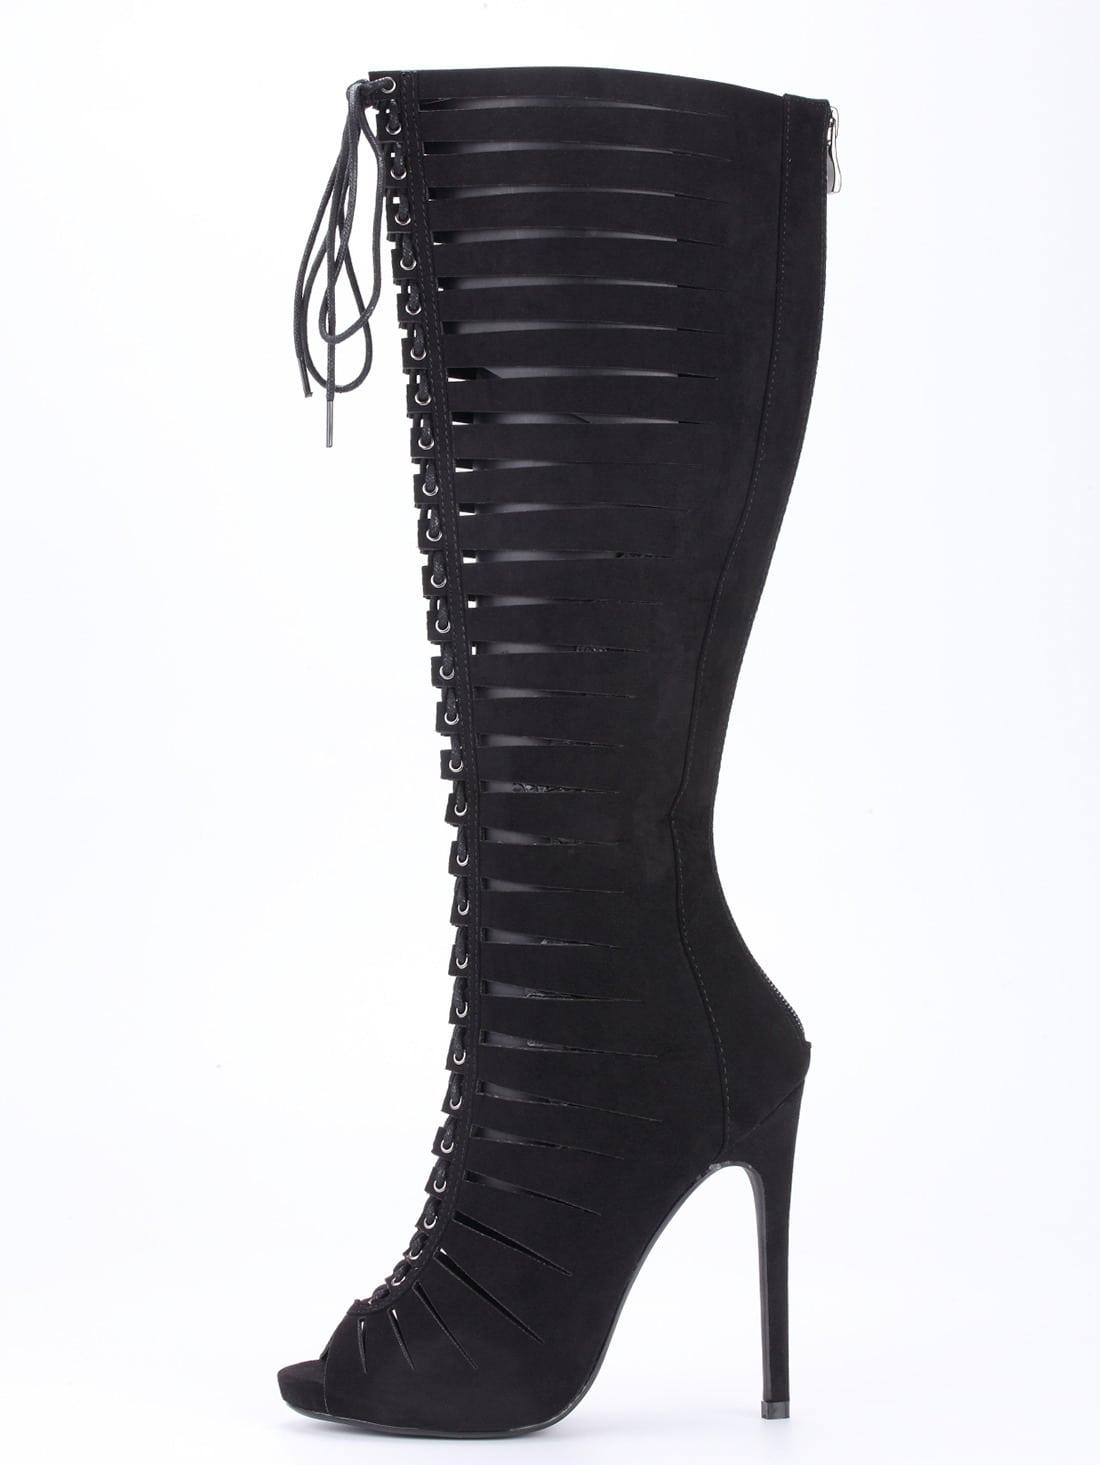 Black Satin Strappy Peep Toe Knee High HeelsBlack Satin Strappy Peep Toe Knee High Heels<br><br>color: Black<br>size: US5.5